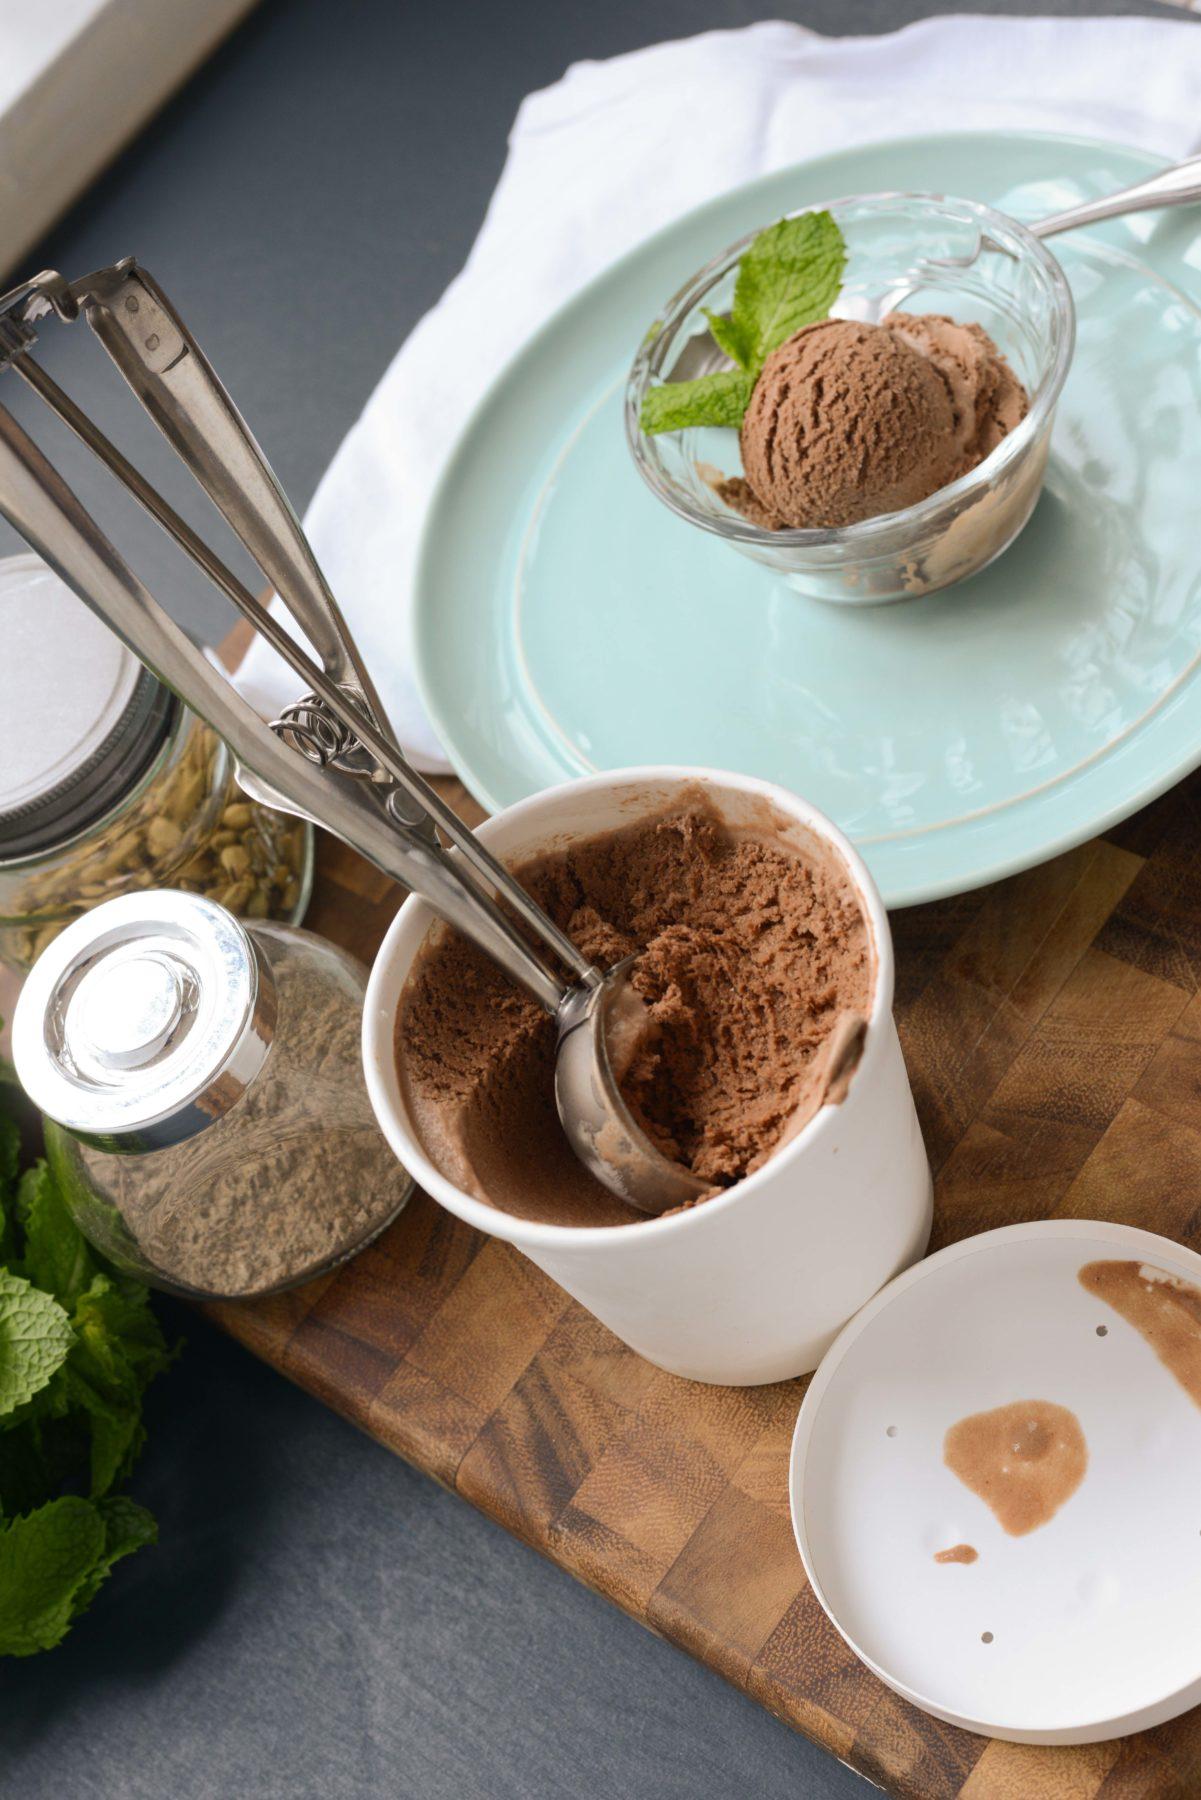 Chocolate Cardamom Ice Cream